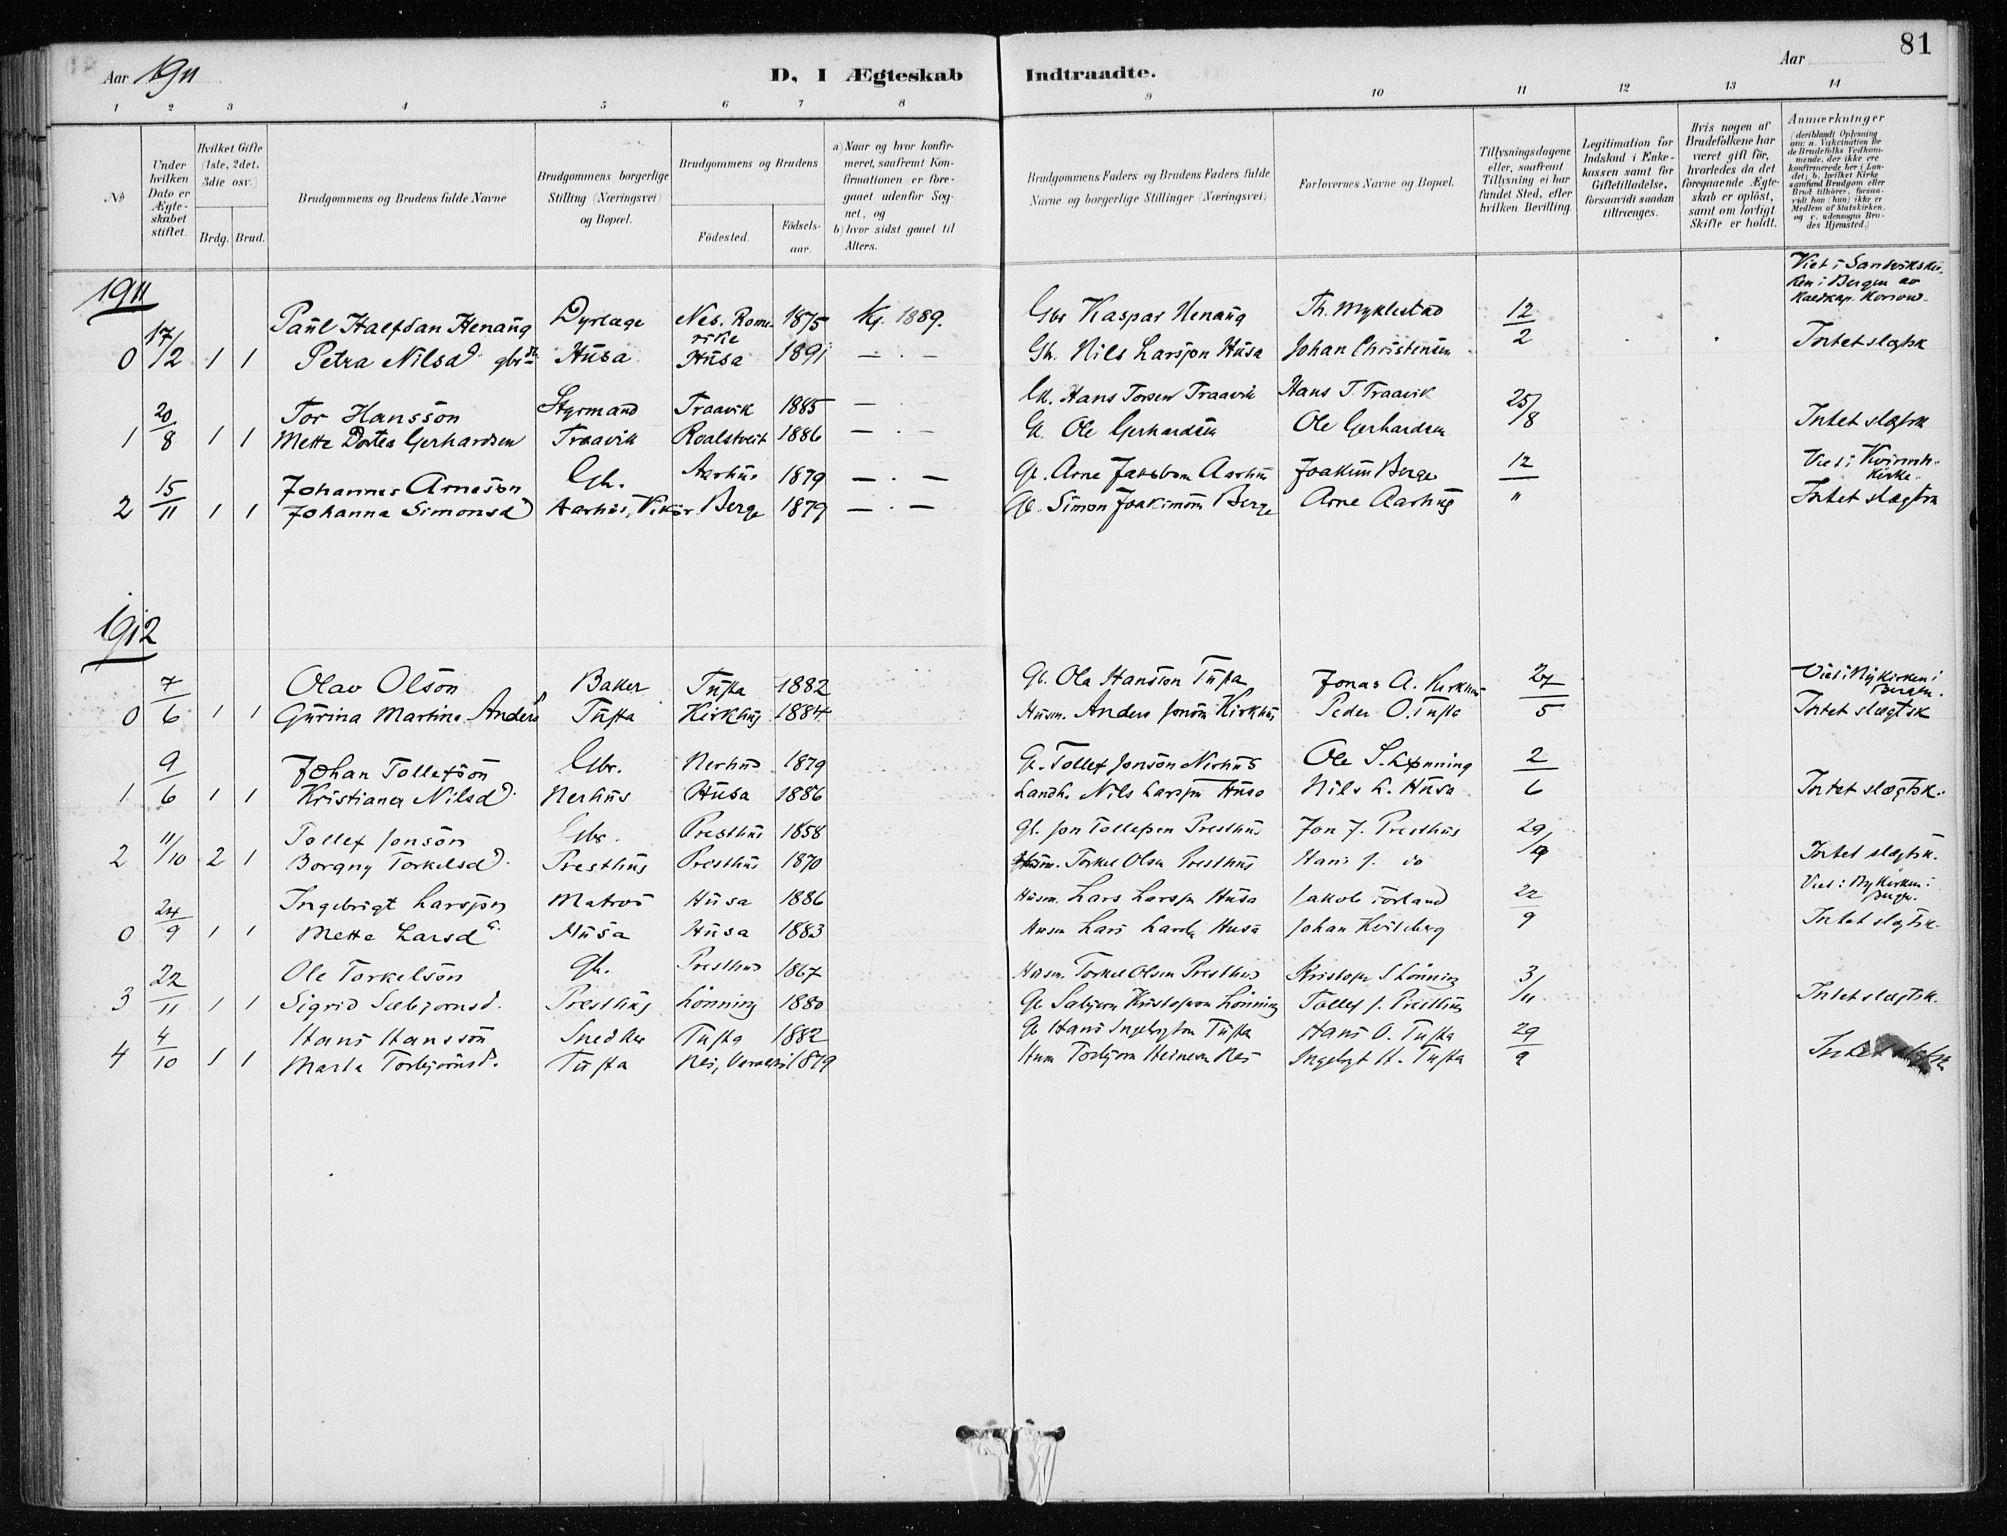 SAB, Kvinnherad Sokneprestembete, H/Haa: Ministerialbok nr. E 1, 1887-1912, s. 81